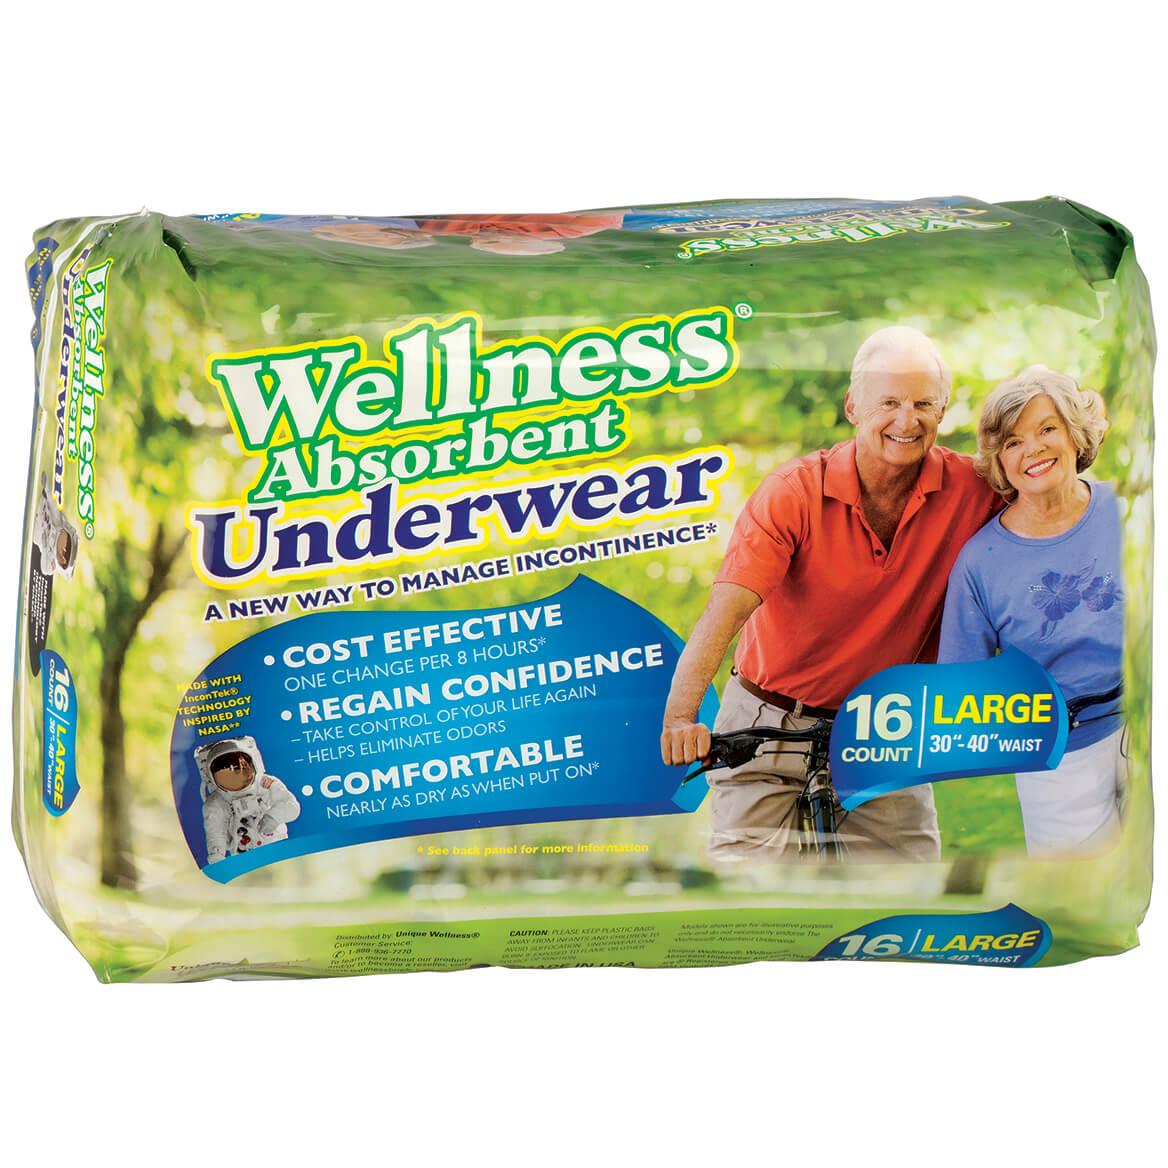 Wellness Absorbent Underwear Trial Pack 2-Pack-367110